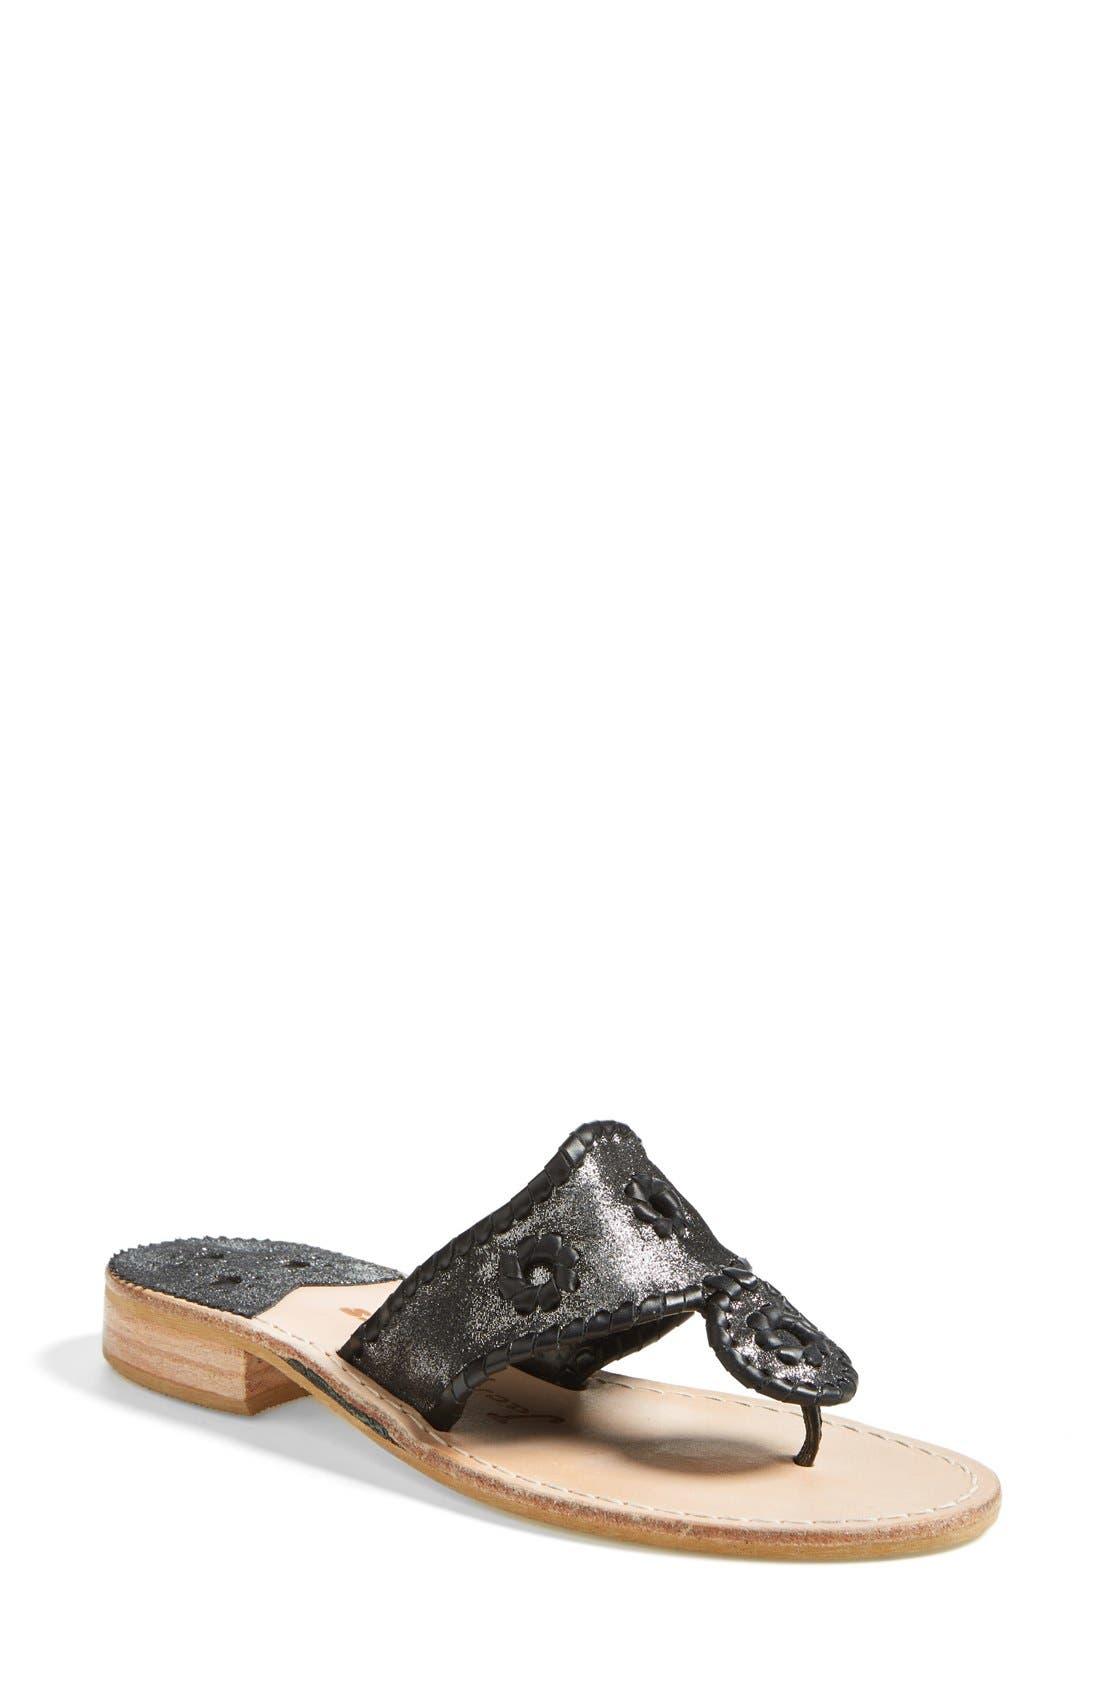 Main Image - Jack Rogers 'Stardust' Thong Sandal (Women)